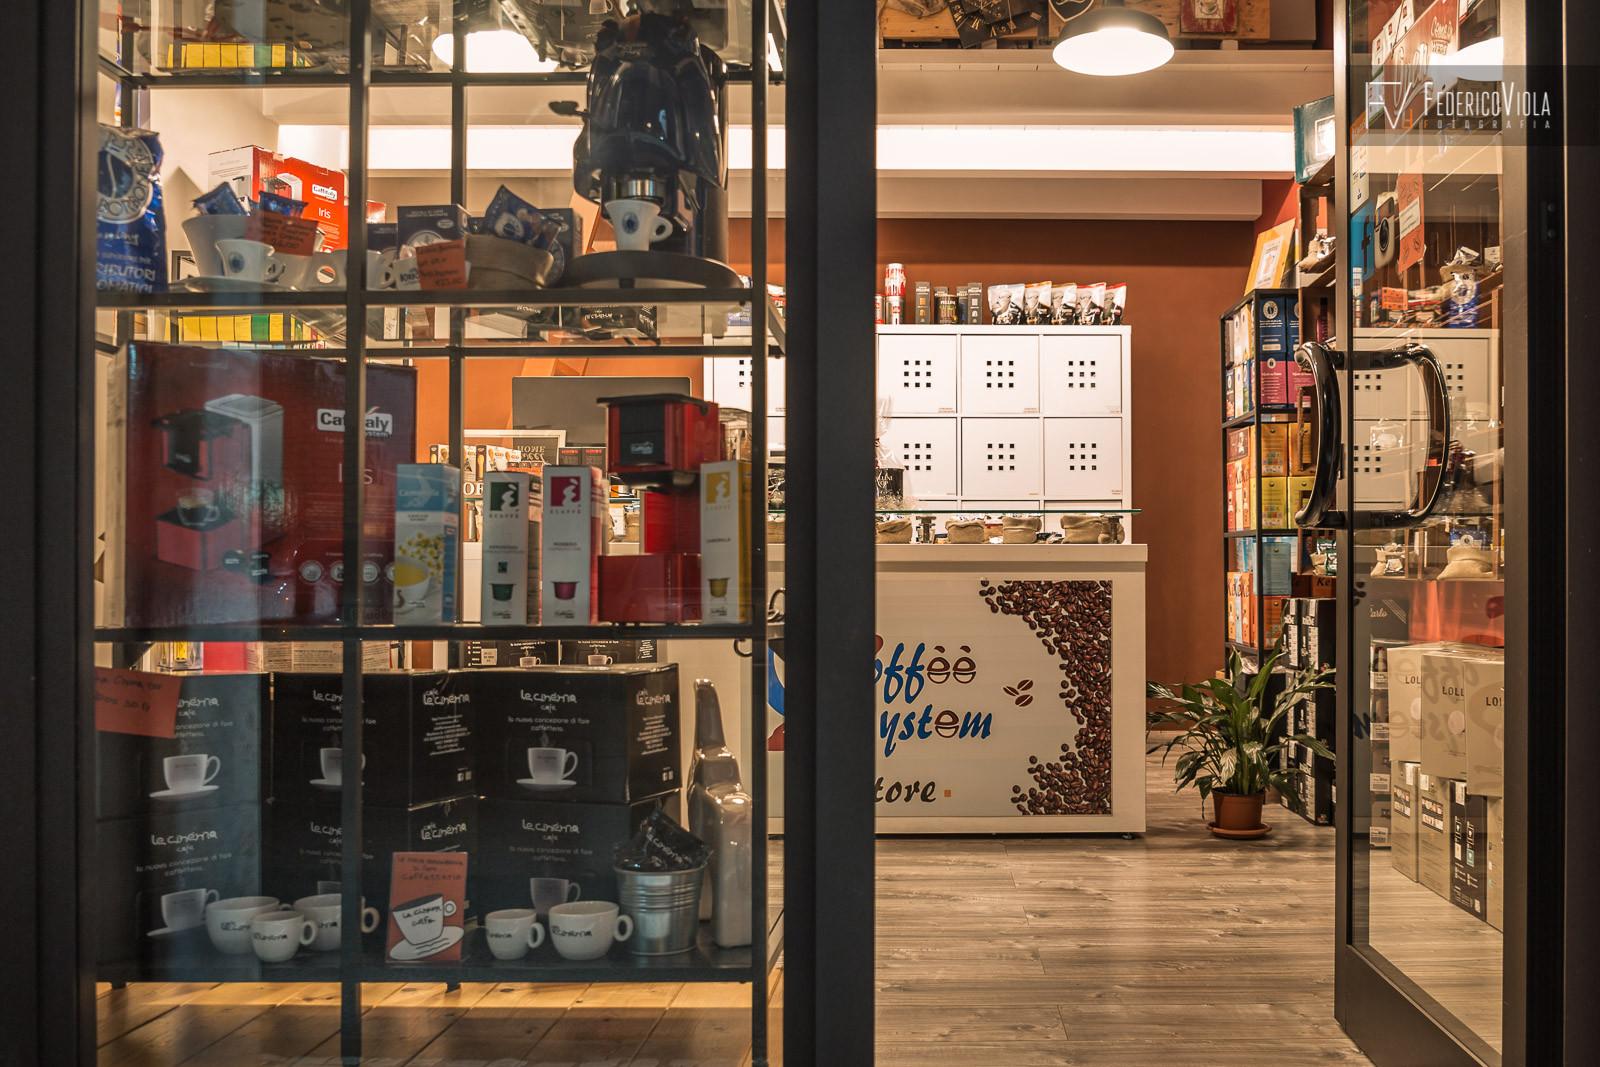 Foto-negozio-Coffee-System-Terracina-Federico-Viola-Fotografia-9